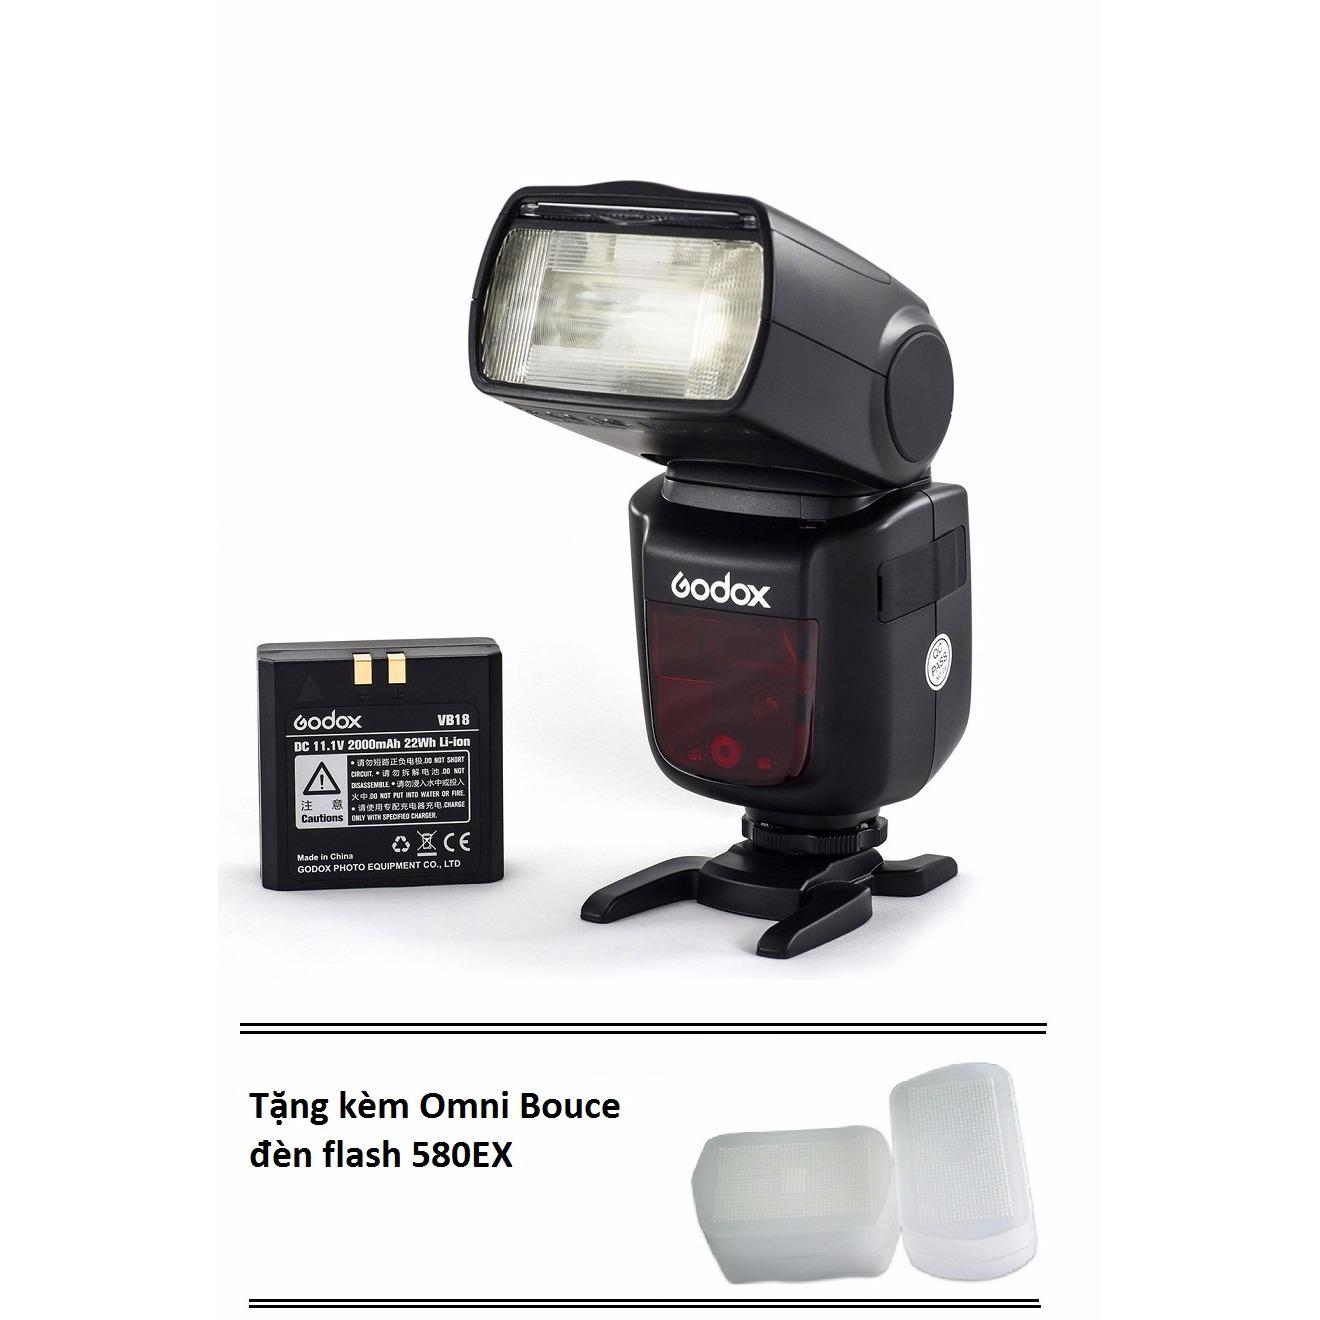 Giá Bán Flash Godox Li Ion Ving V860Ii For Nikon Kem Pin Sạc Tặng Kem 1 Omni Bounce Flash Đen Godox Tốt Nhất